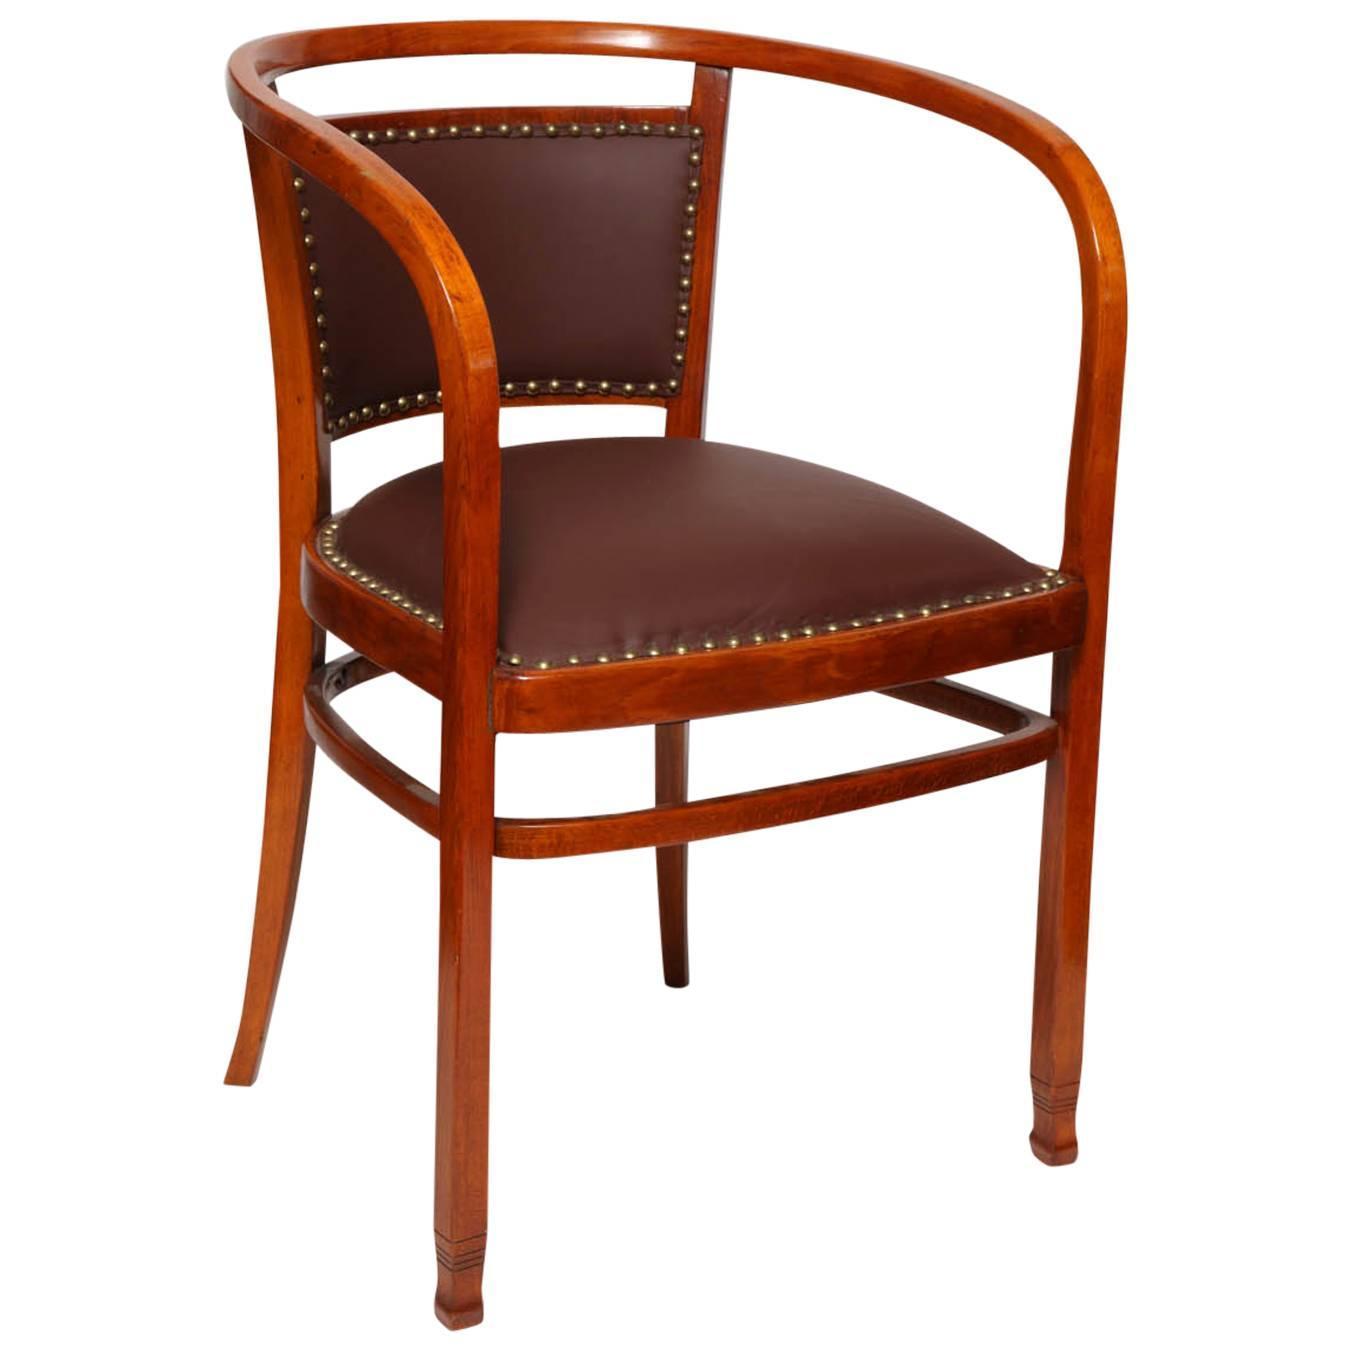 Jacob Josef Kohn Furniture Chairs Sofas Collectibles More  # Adolf Loos Muebles